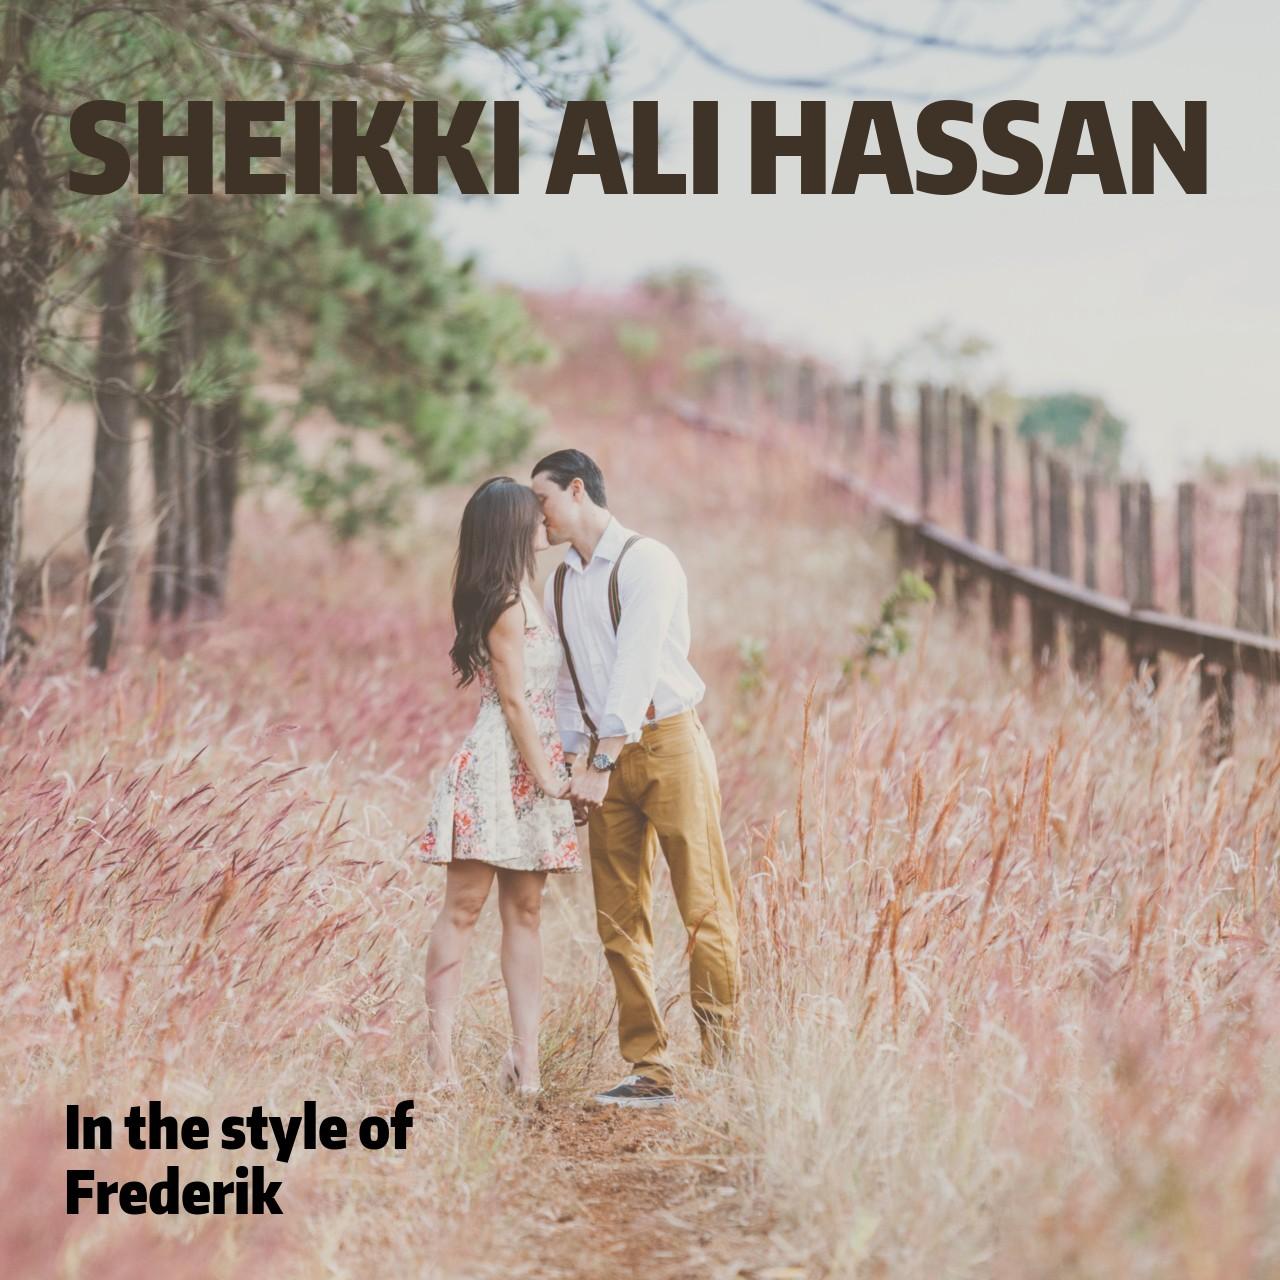 Frederik Sheikki Ali Hassan